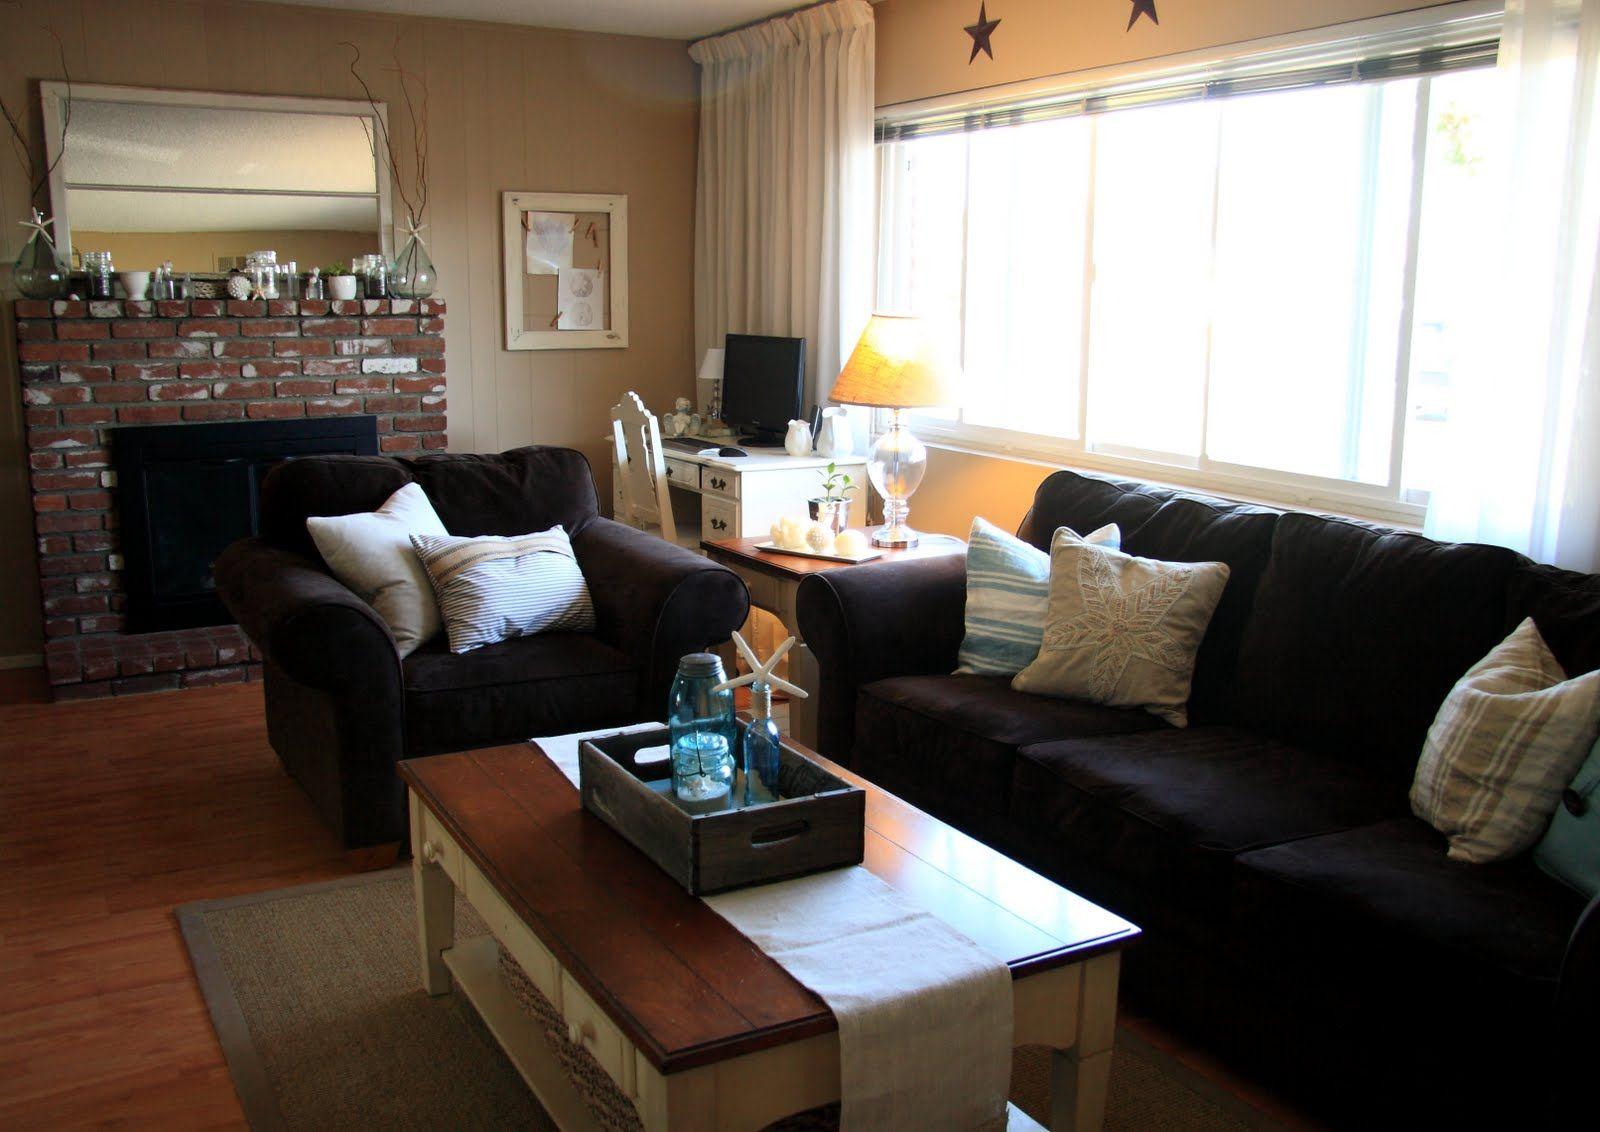 Exceptional Black Furniture Room Design | Comfortable Original Living Room With Black  Furniture Design Listed In .